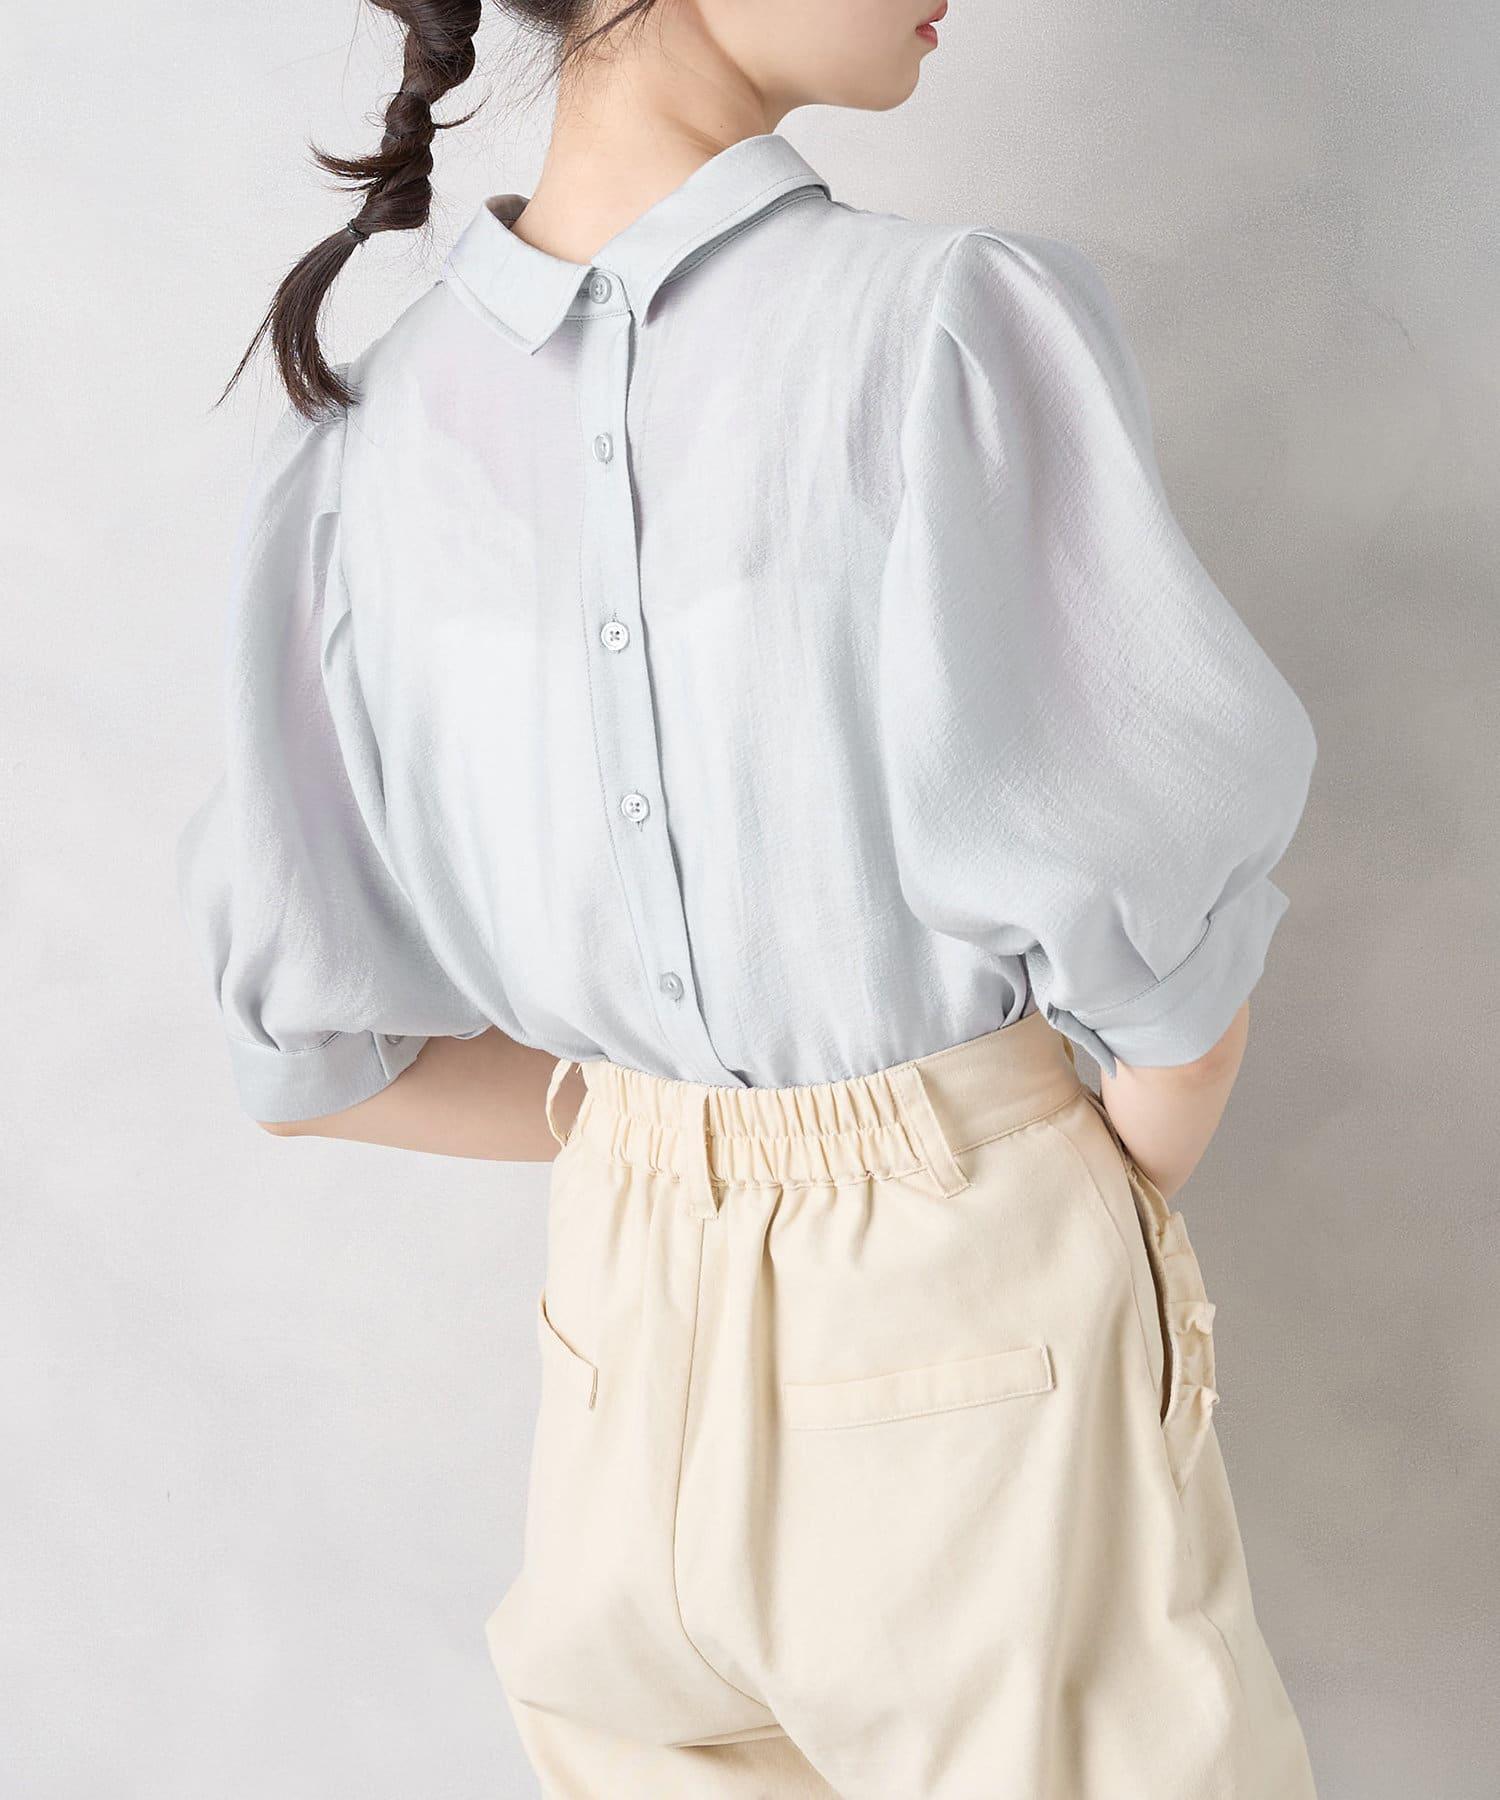 OLIVE des OLIVE(オリーブ デ オリーブ) ダブルフロント袖ボリュームシャツ